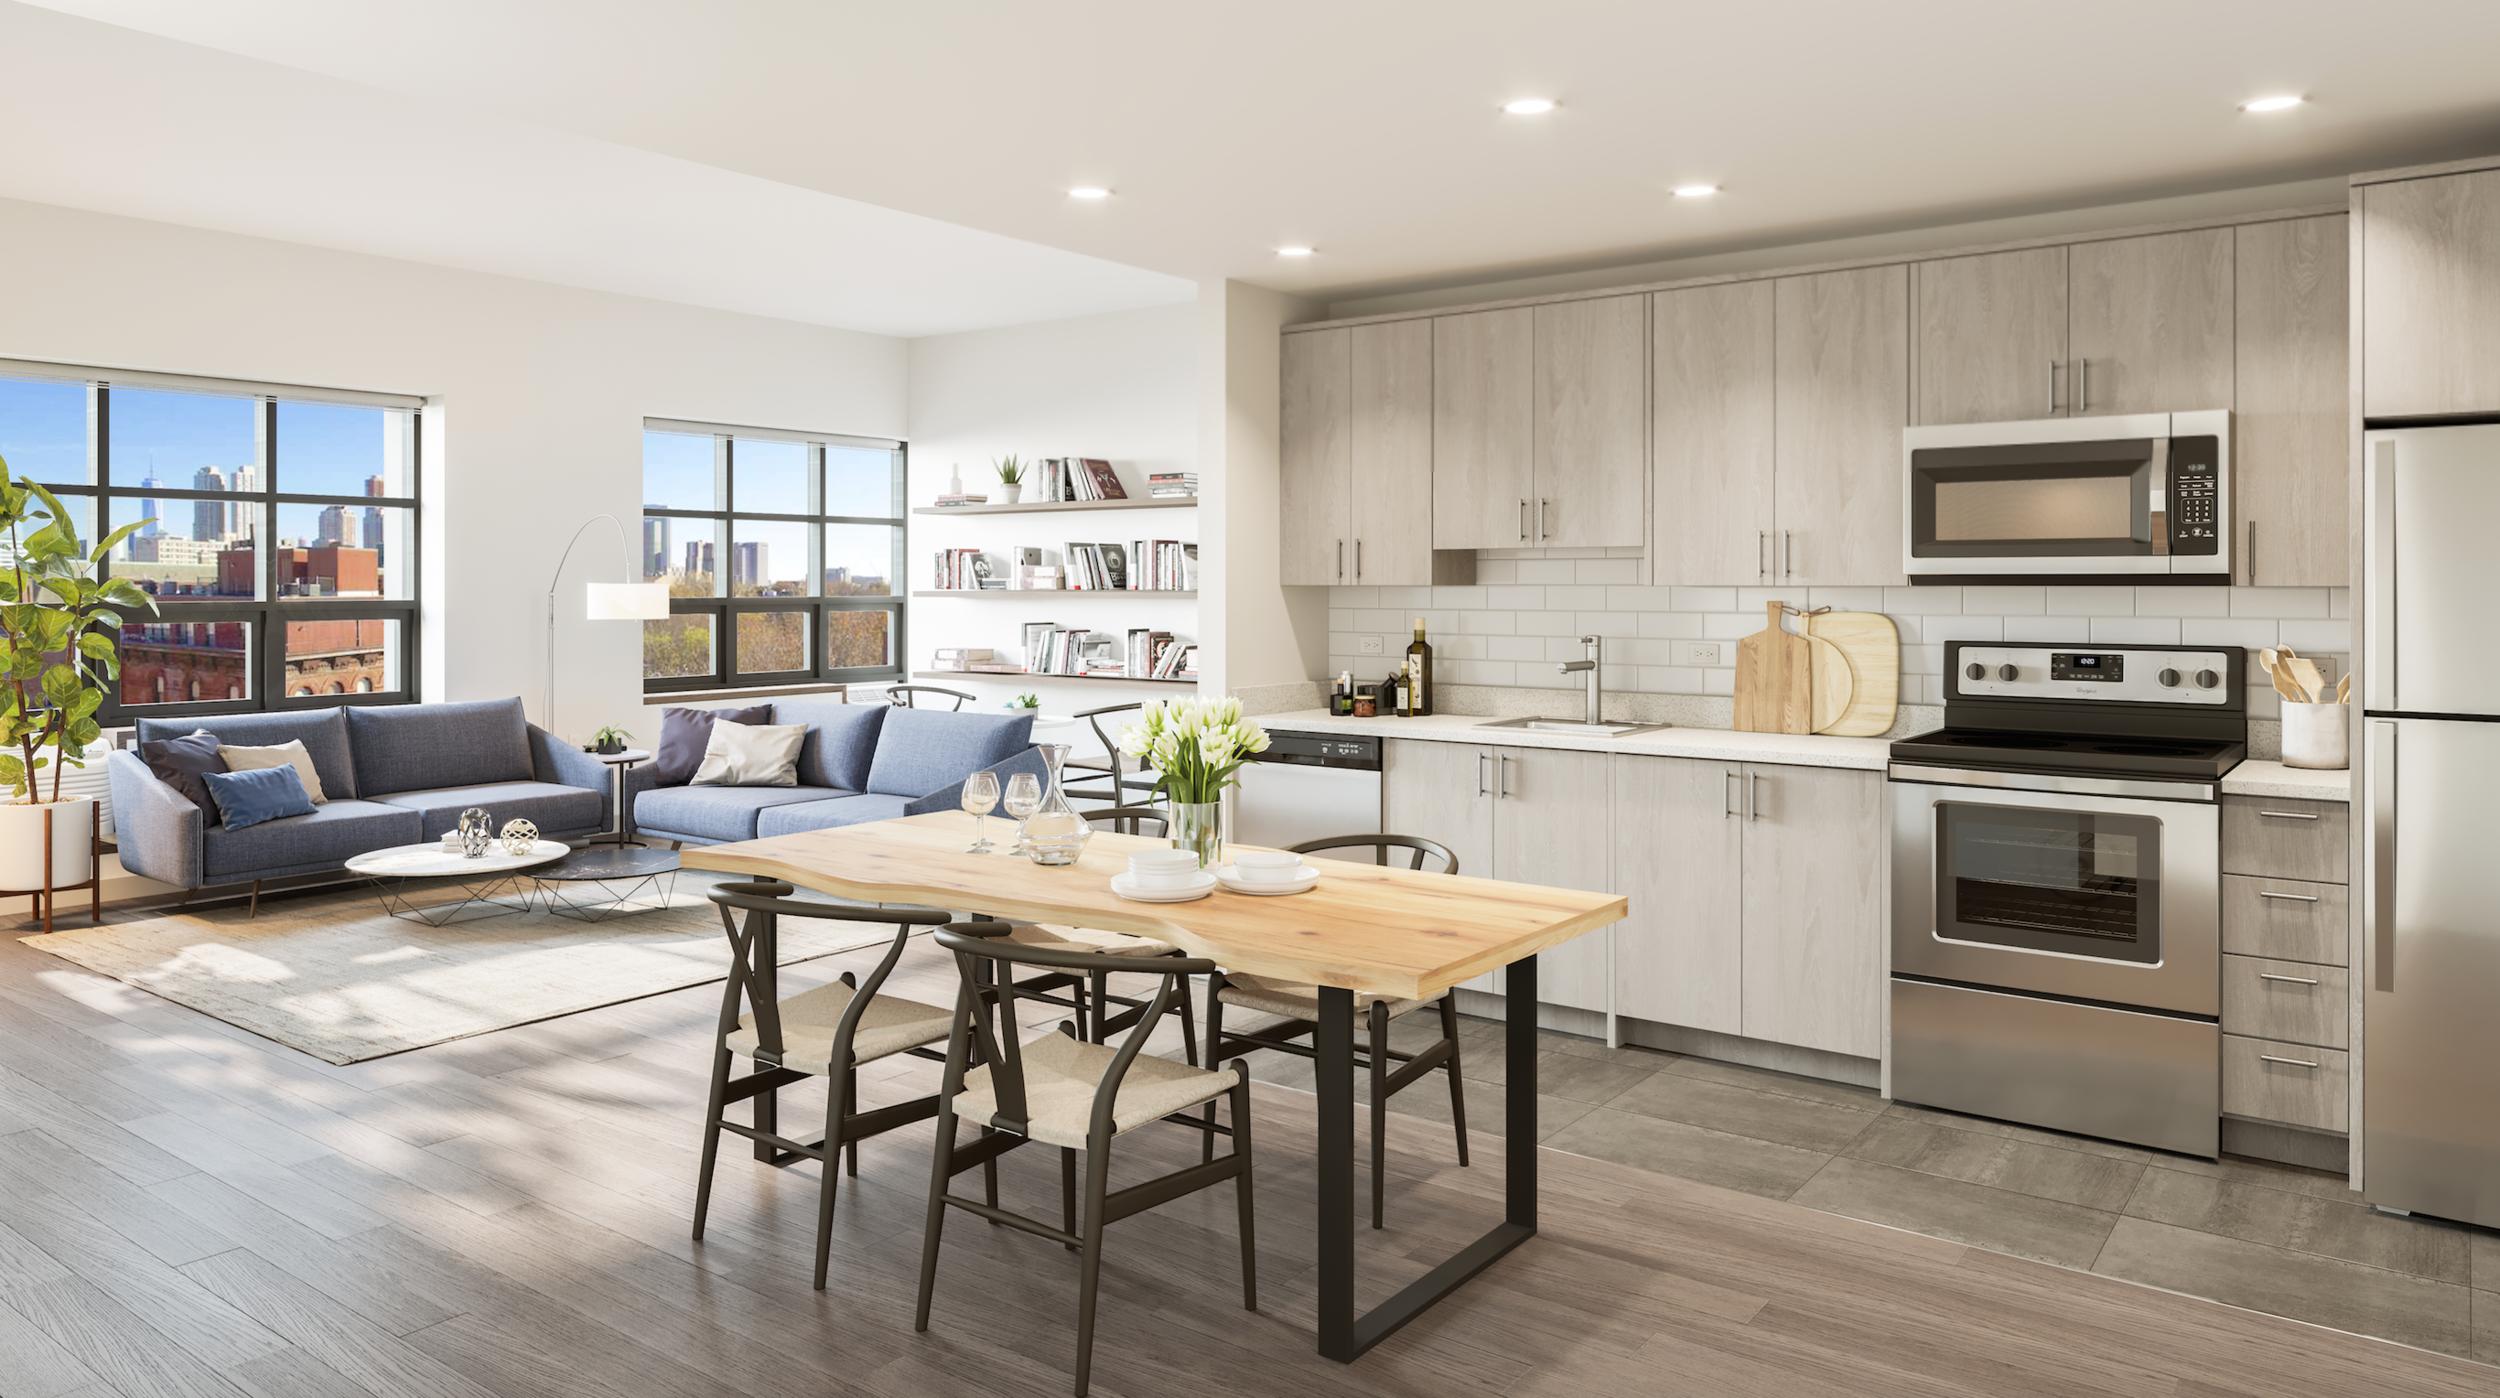 LeFrak Reveals Revetment House In The Hamilton Park Neighborhood Of Jersey City